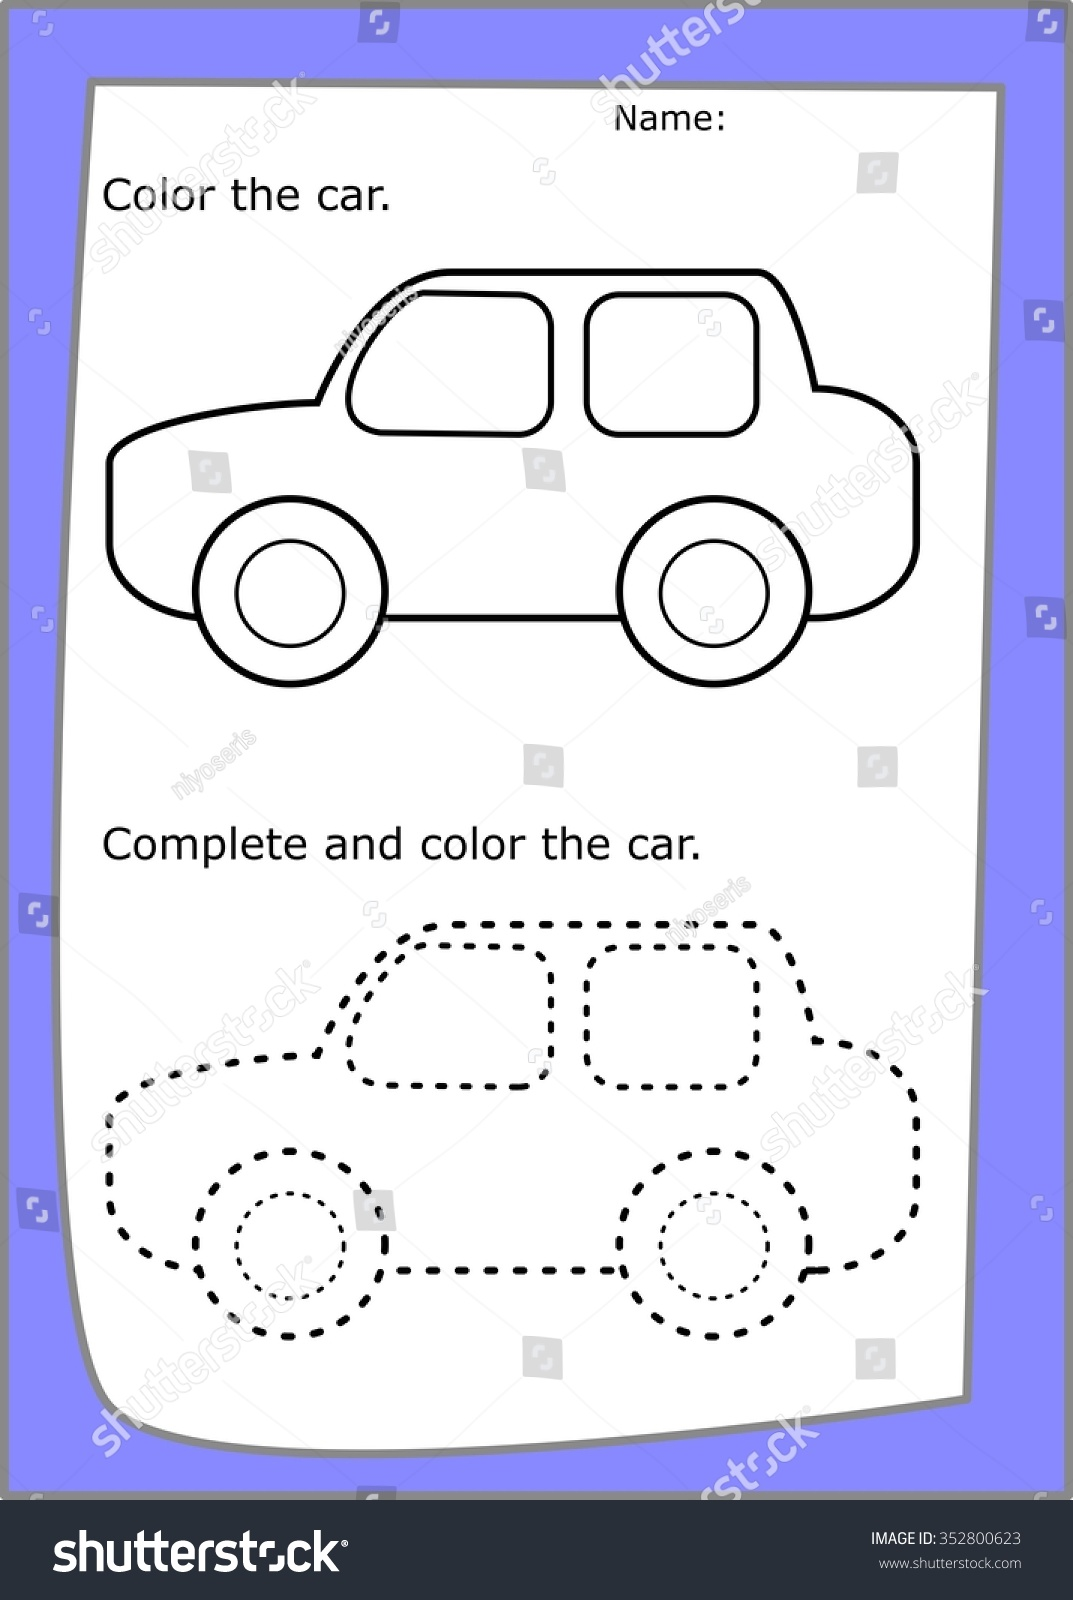 Car Coloring Worksheet Dotted Lines Stock Illustration